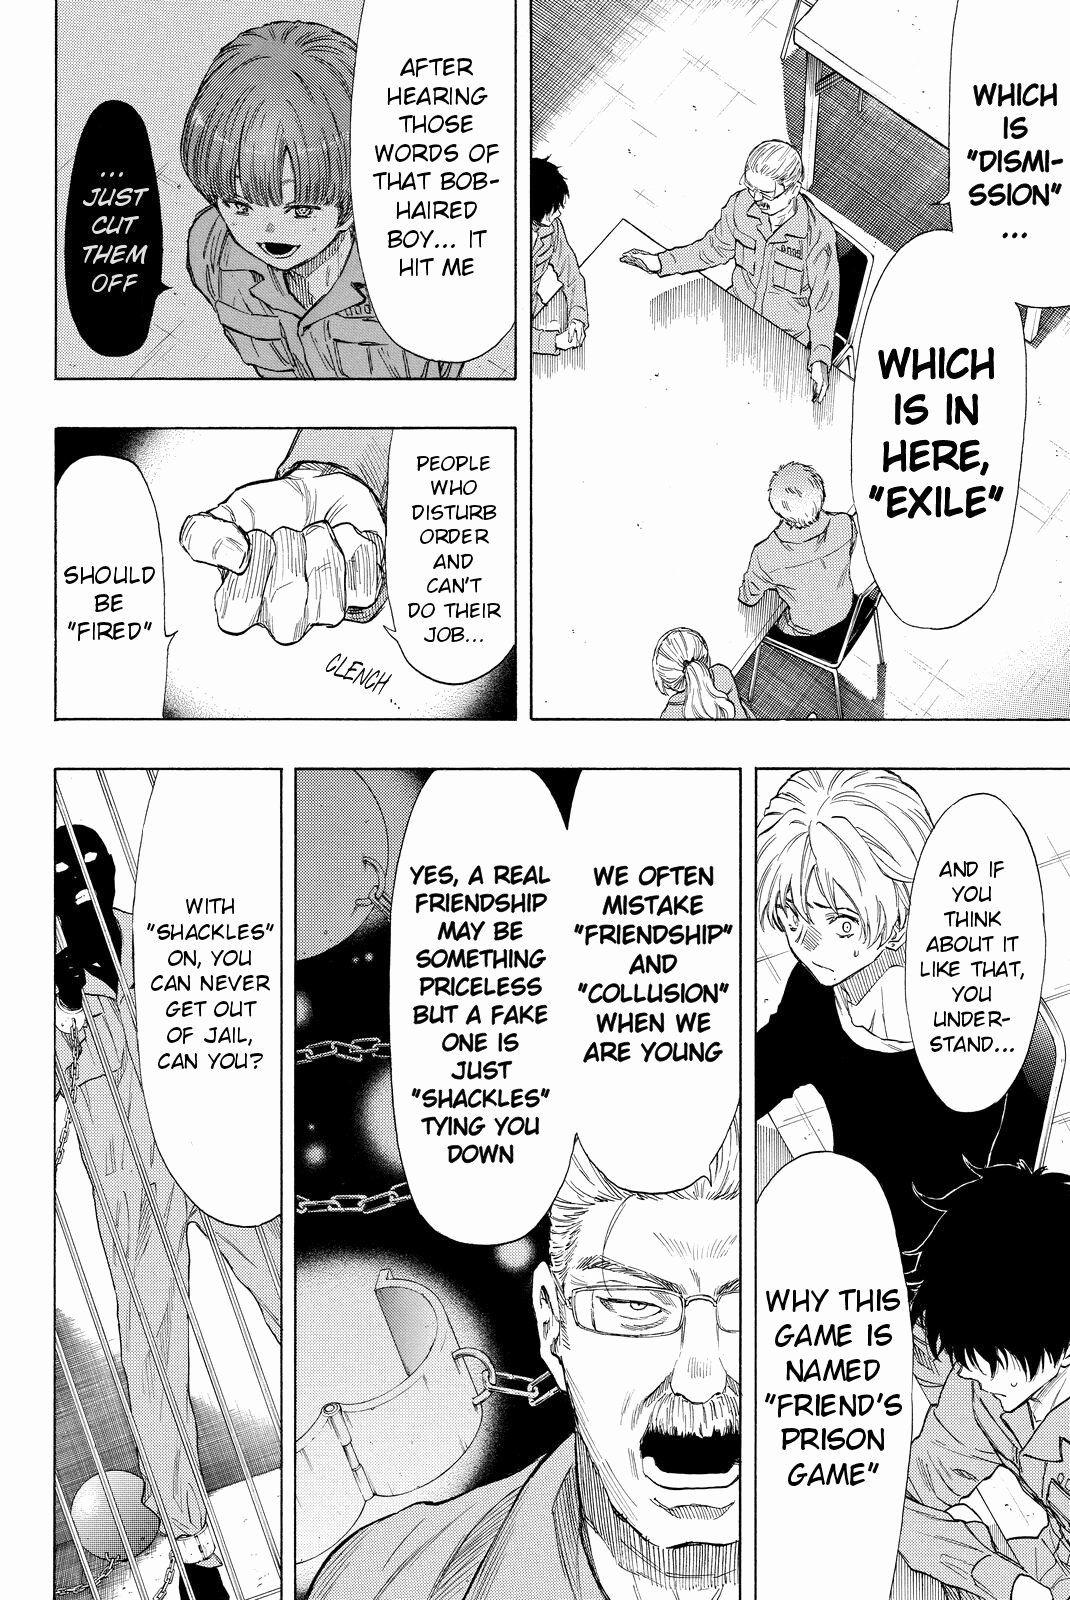 Online Manga Drawing Book New Tomodachi Game Chap 37 English Read Manga Line At In 2020 Manga Drawing Books Online Manga Manga Drawing